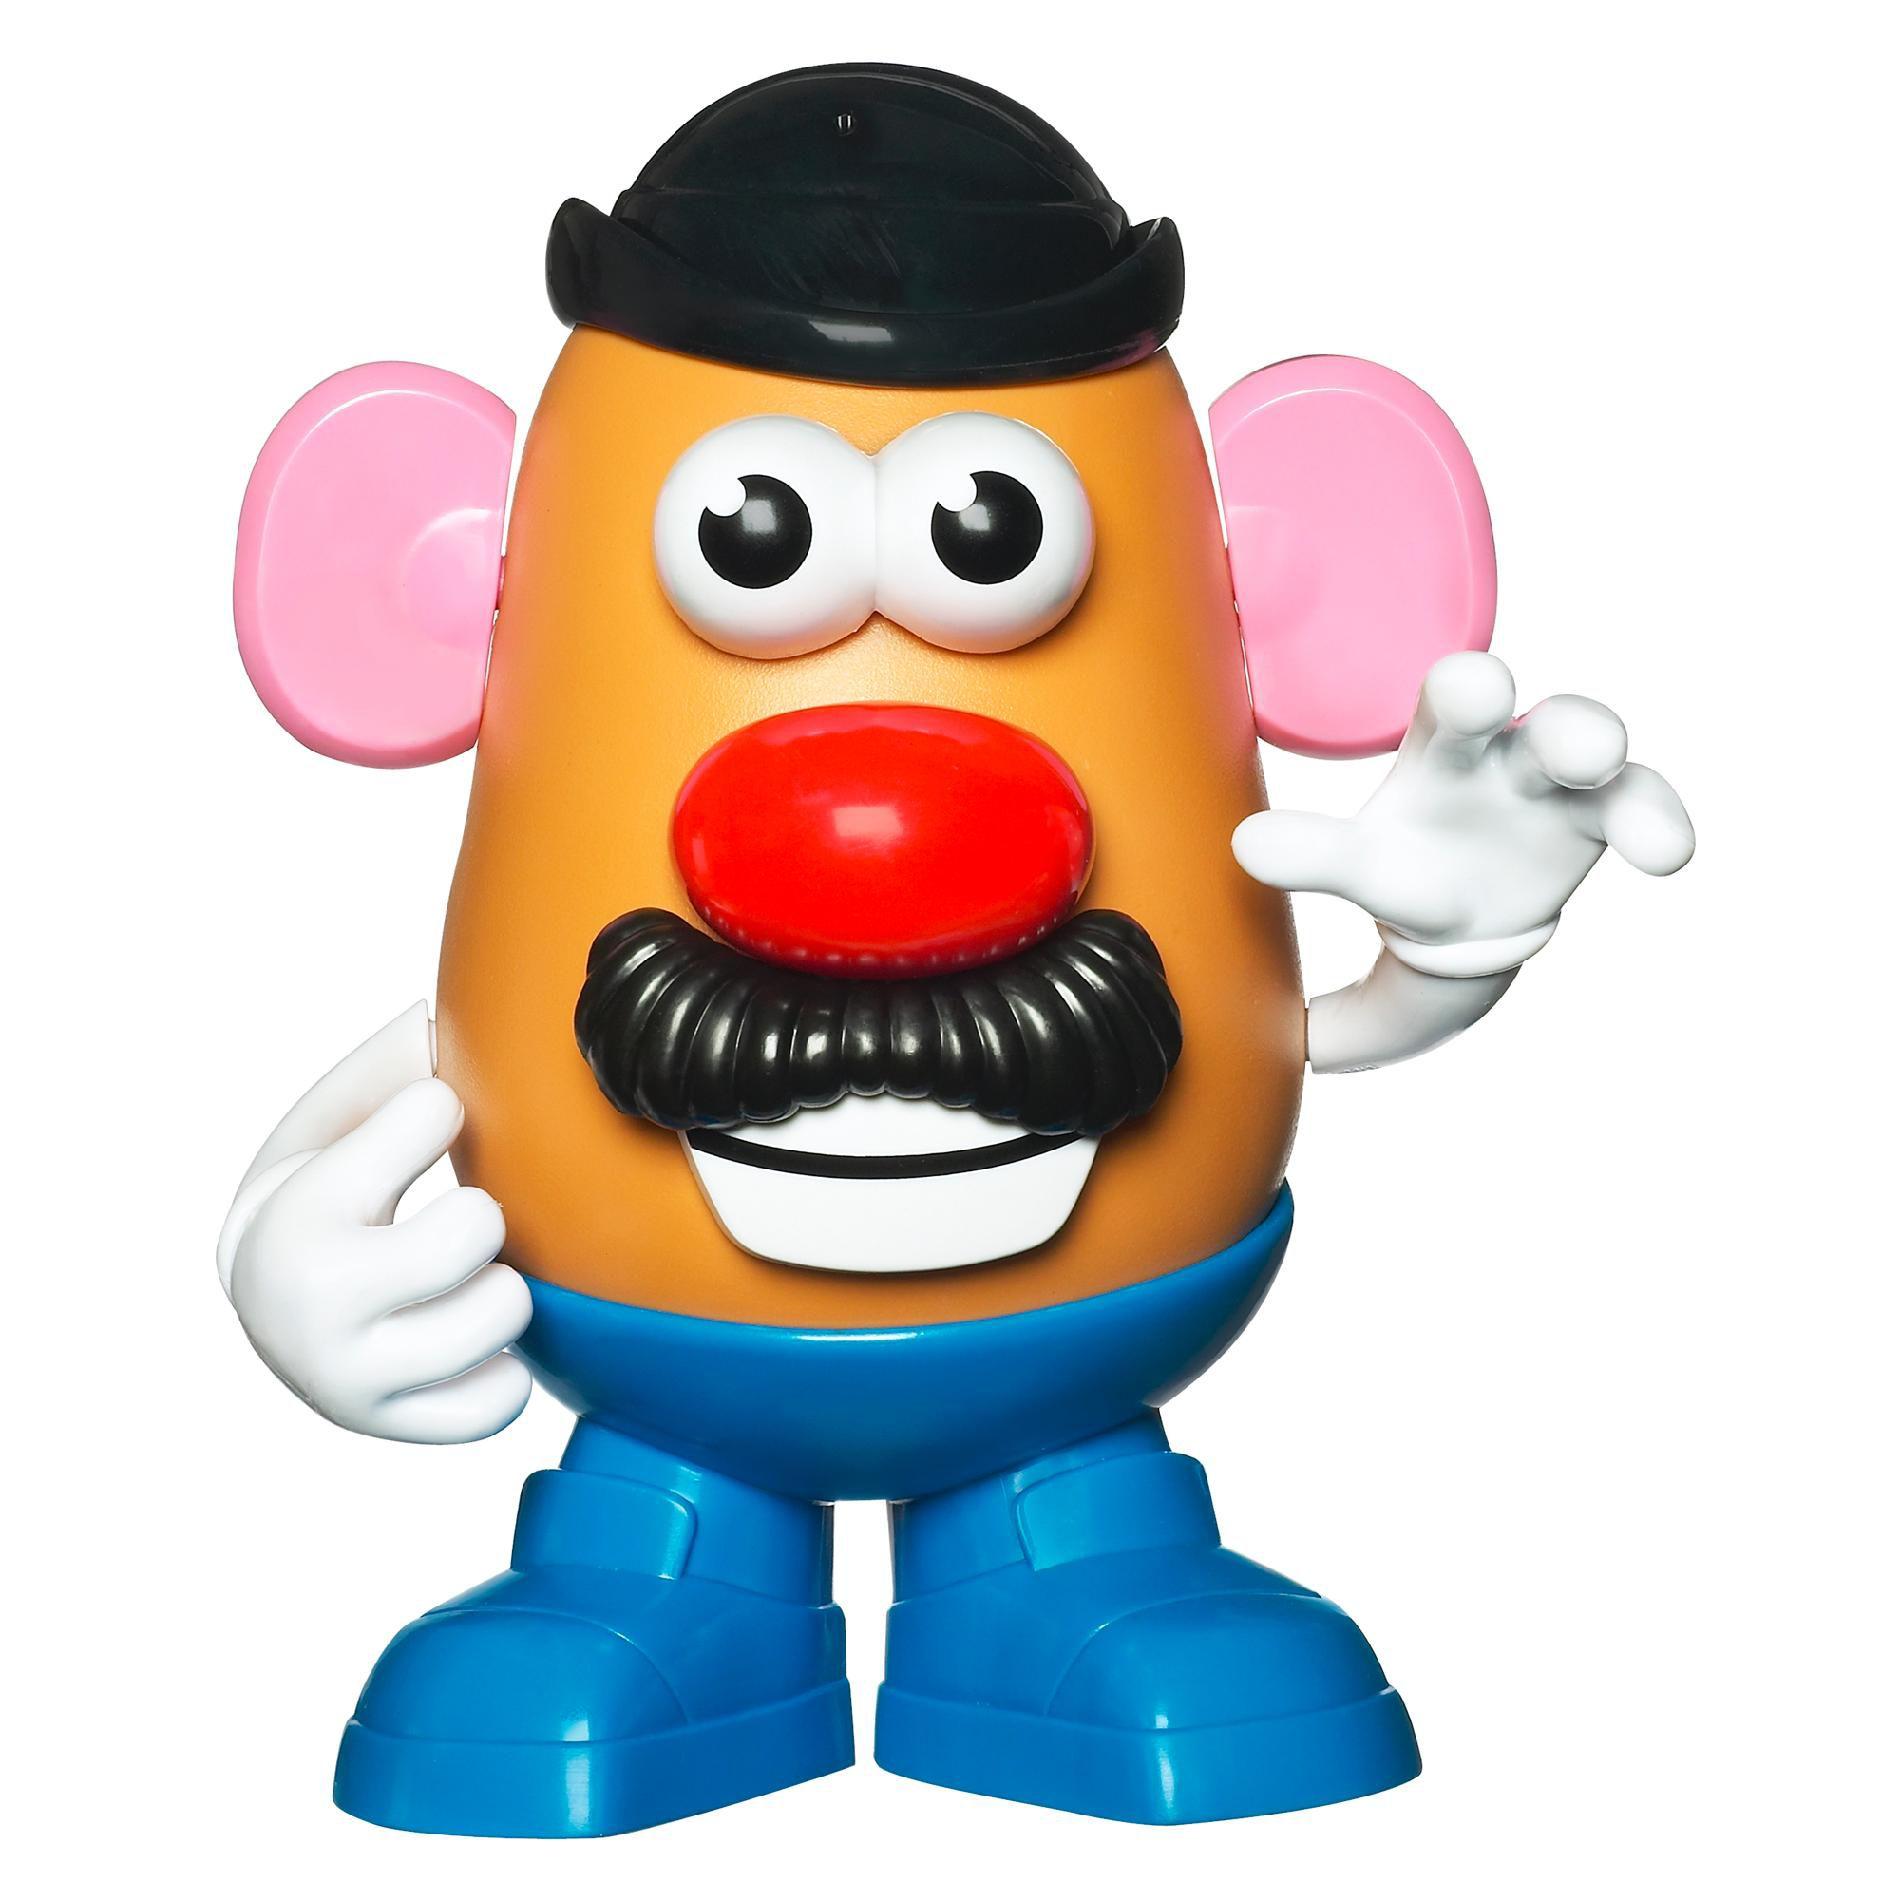 Playskool Mr. Potato Head Figure PartNumber: 004W004739011004P KsnValue: 004W004739011004 MfgPartNumber: 27657